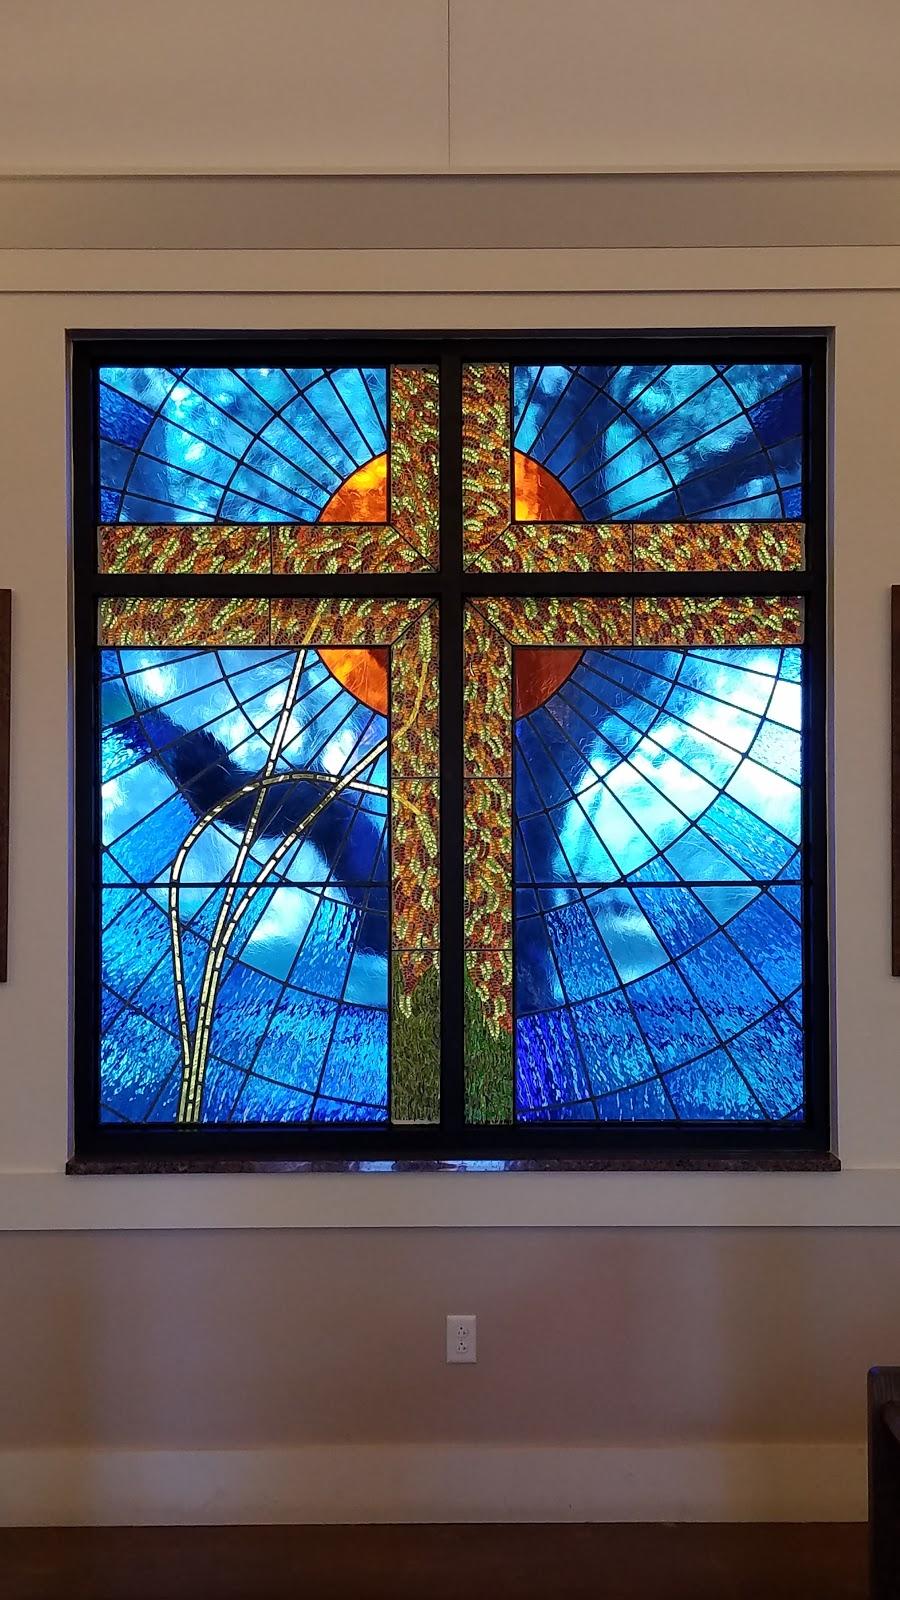 St. John The Evangelist Catholic Church - church  | Photo 6 of 10 | Address: 105 Ranch Rd 1431, Marble Falls, TX 78654, USA | Phone: (830) 693-5134